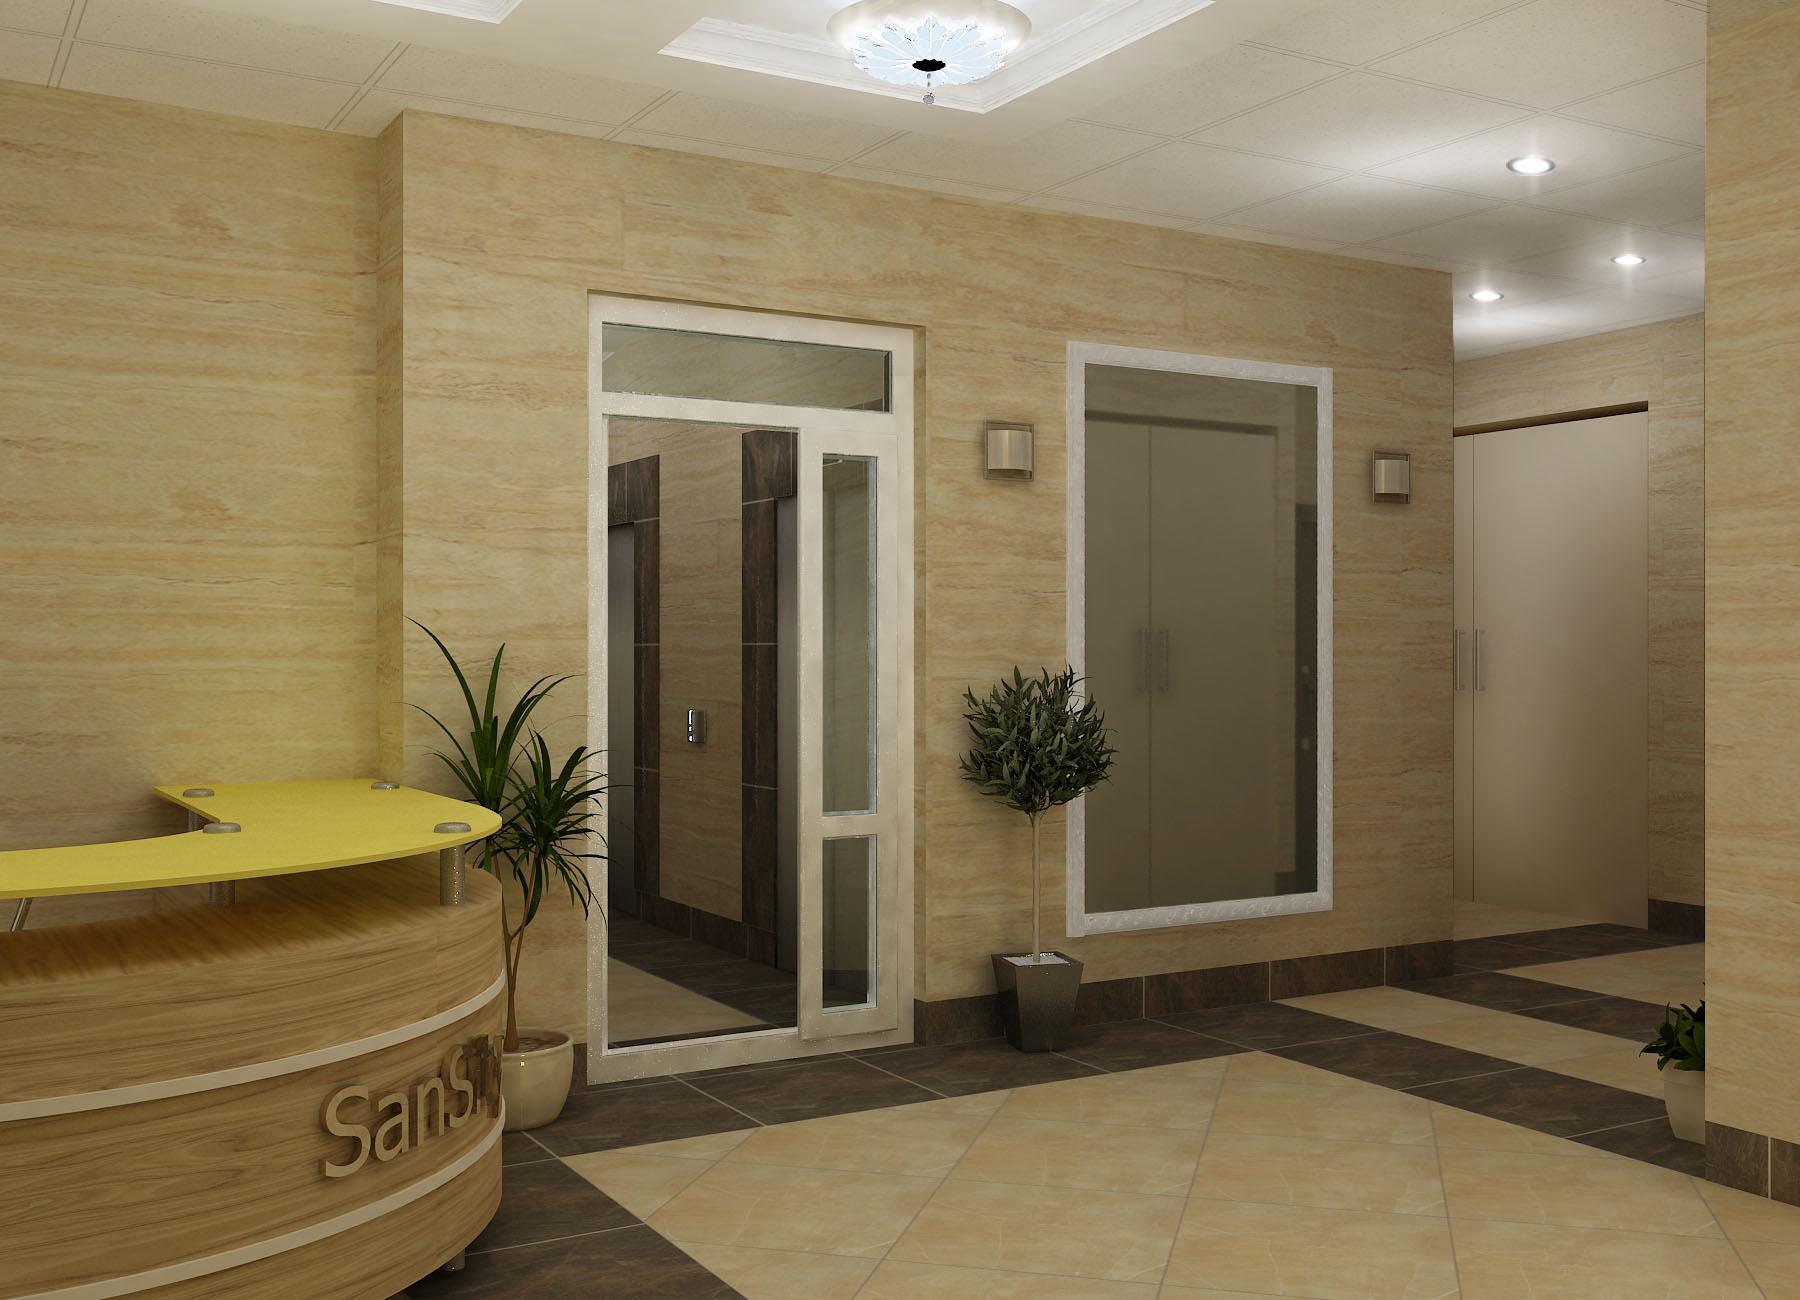 ЖК Sun City (Сан Сити) Новостройка в Одессе Котовского Холл